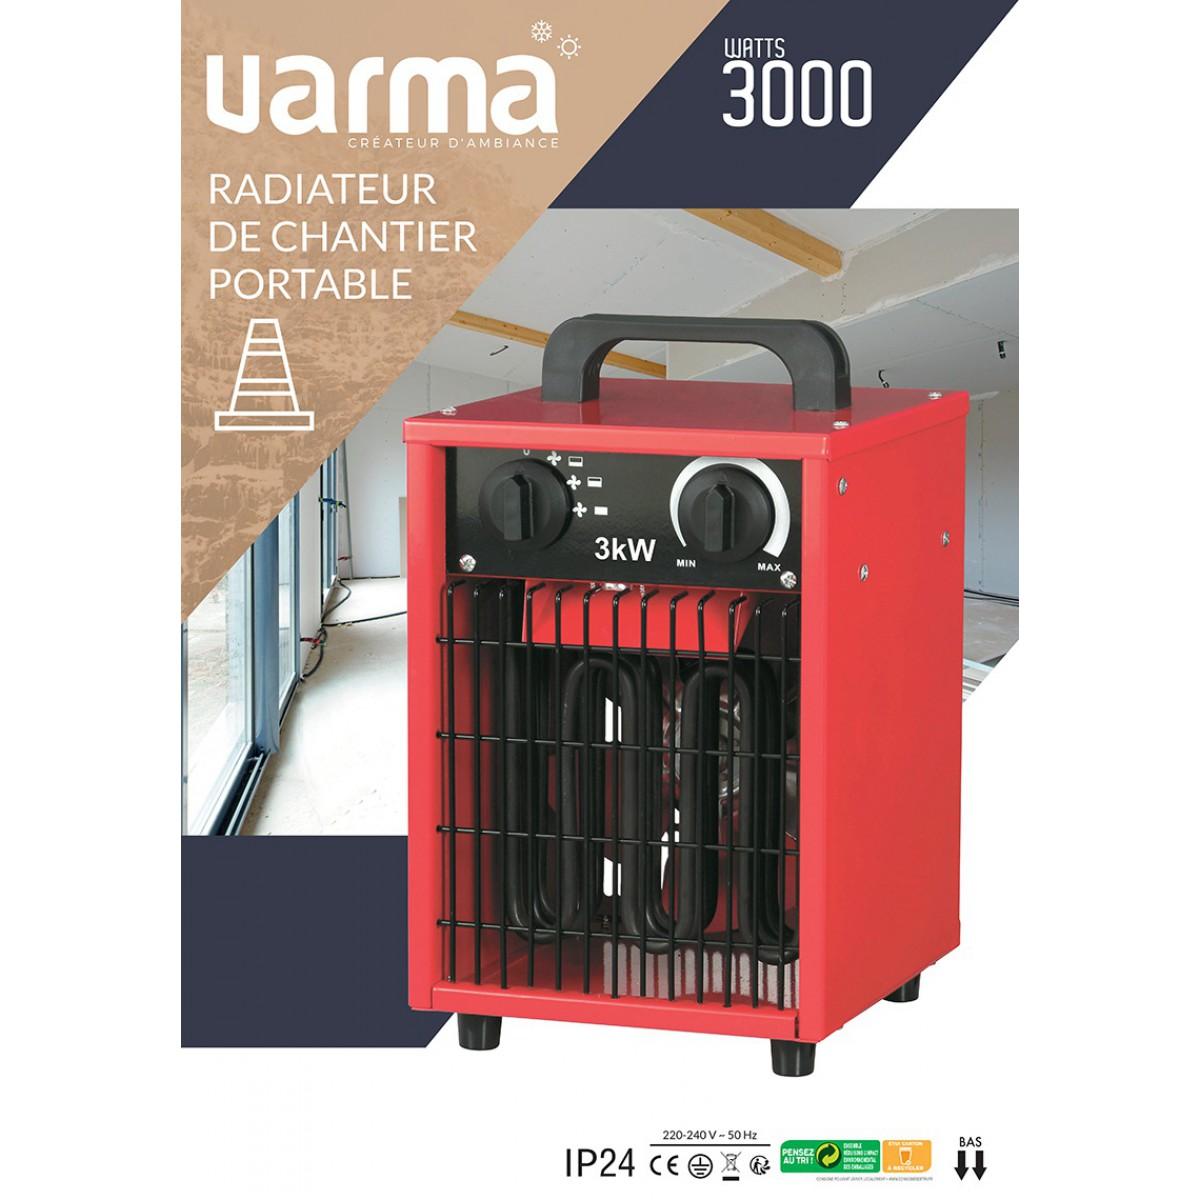 Radiateur de chantier portable Cube Varma - 3000 W